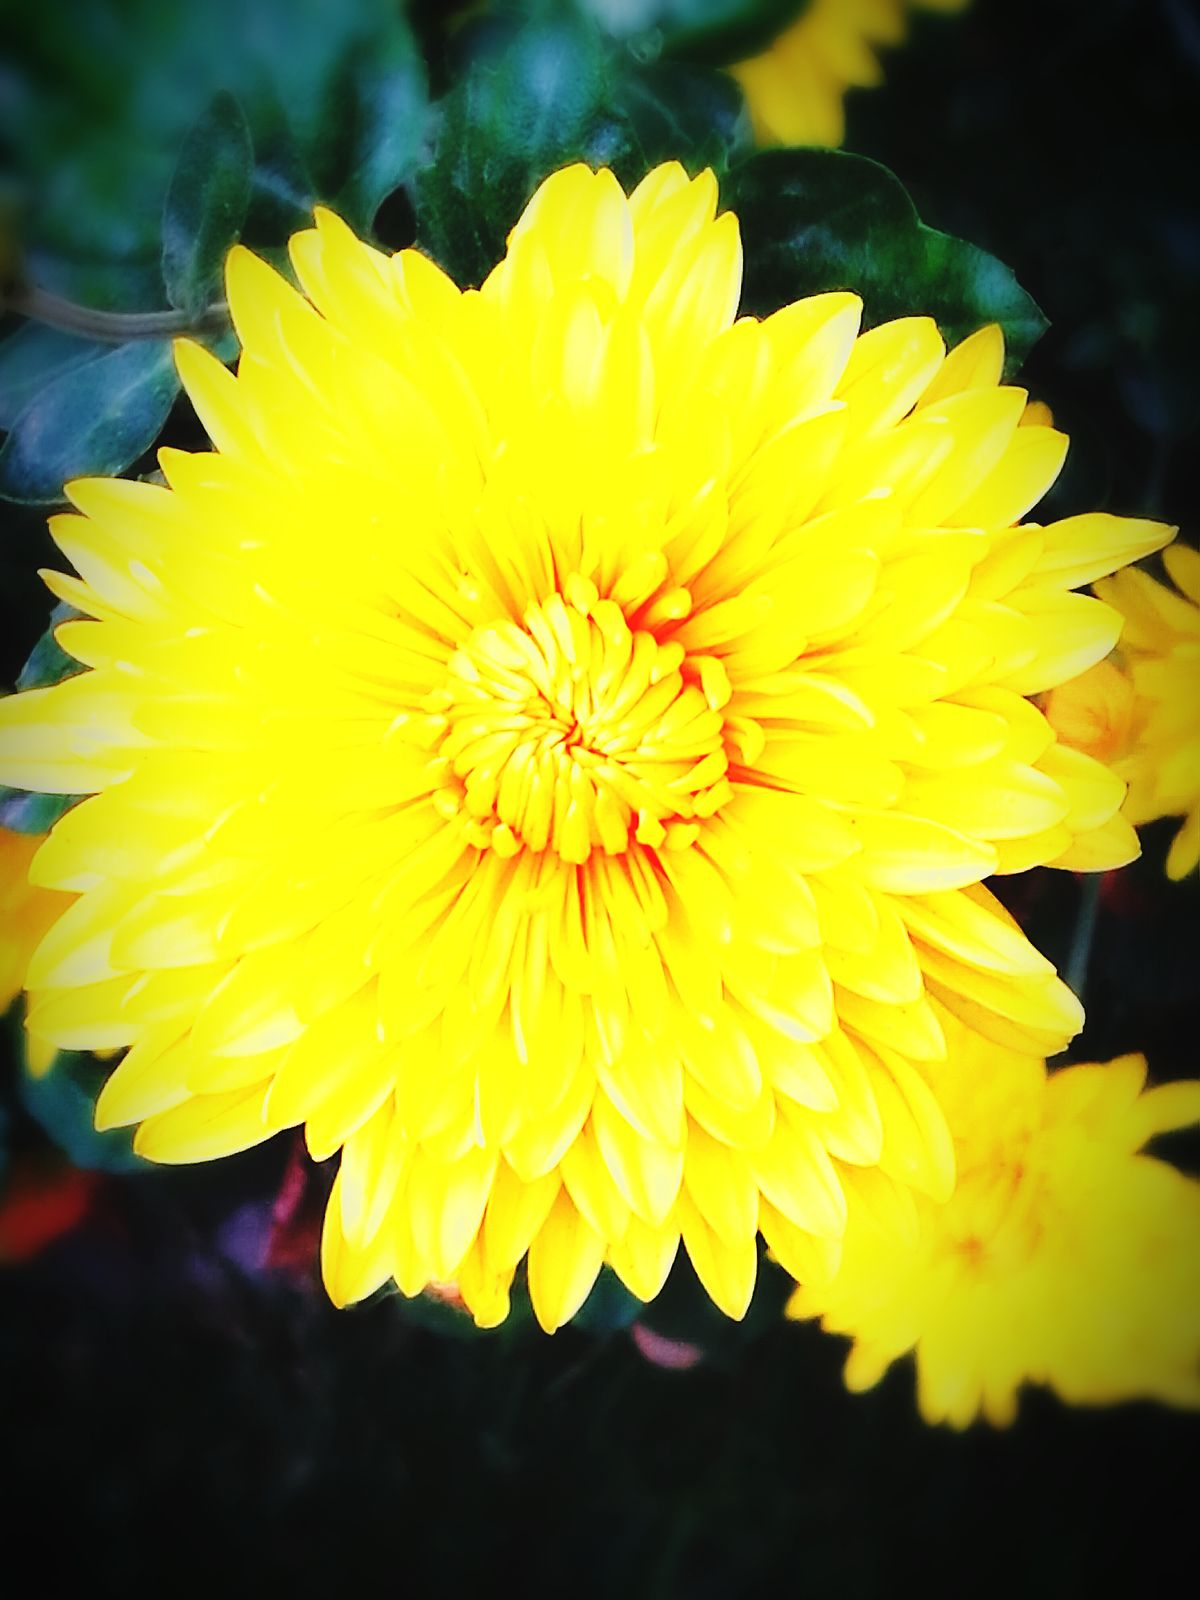 Ммм ммммм... Flower Yellow Fragility Freshness Nature Petal Beauty In Nature